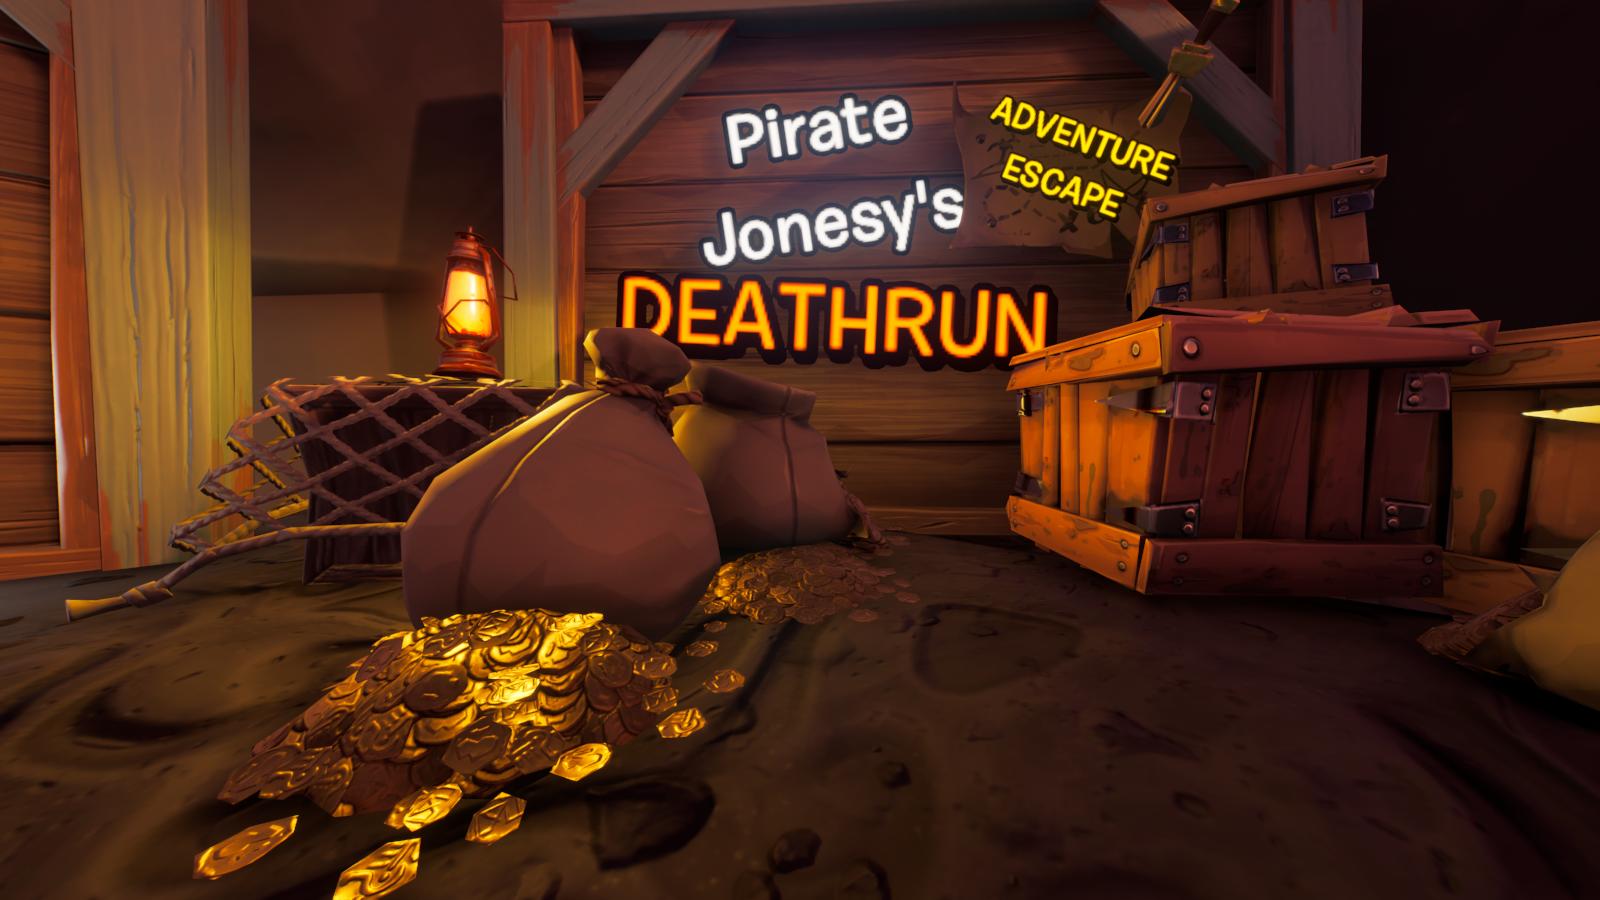 Pirate Jonesys Adventure Escape Deathrun 7452-9966-3879 by FCHQ